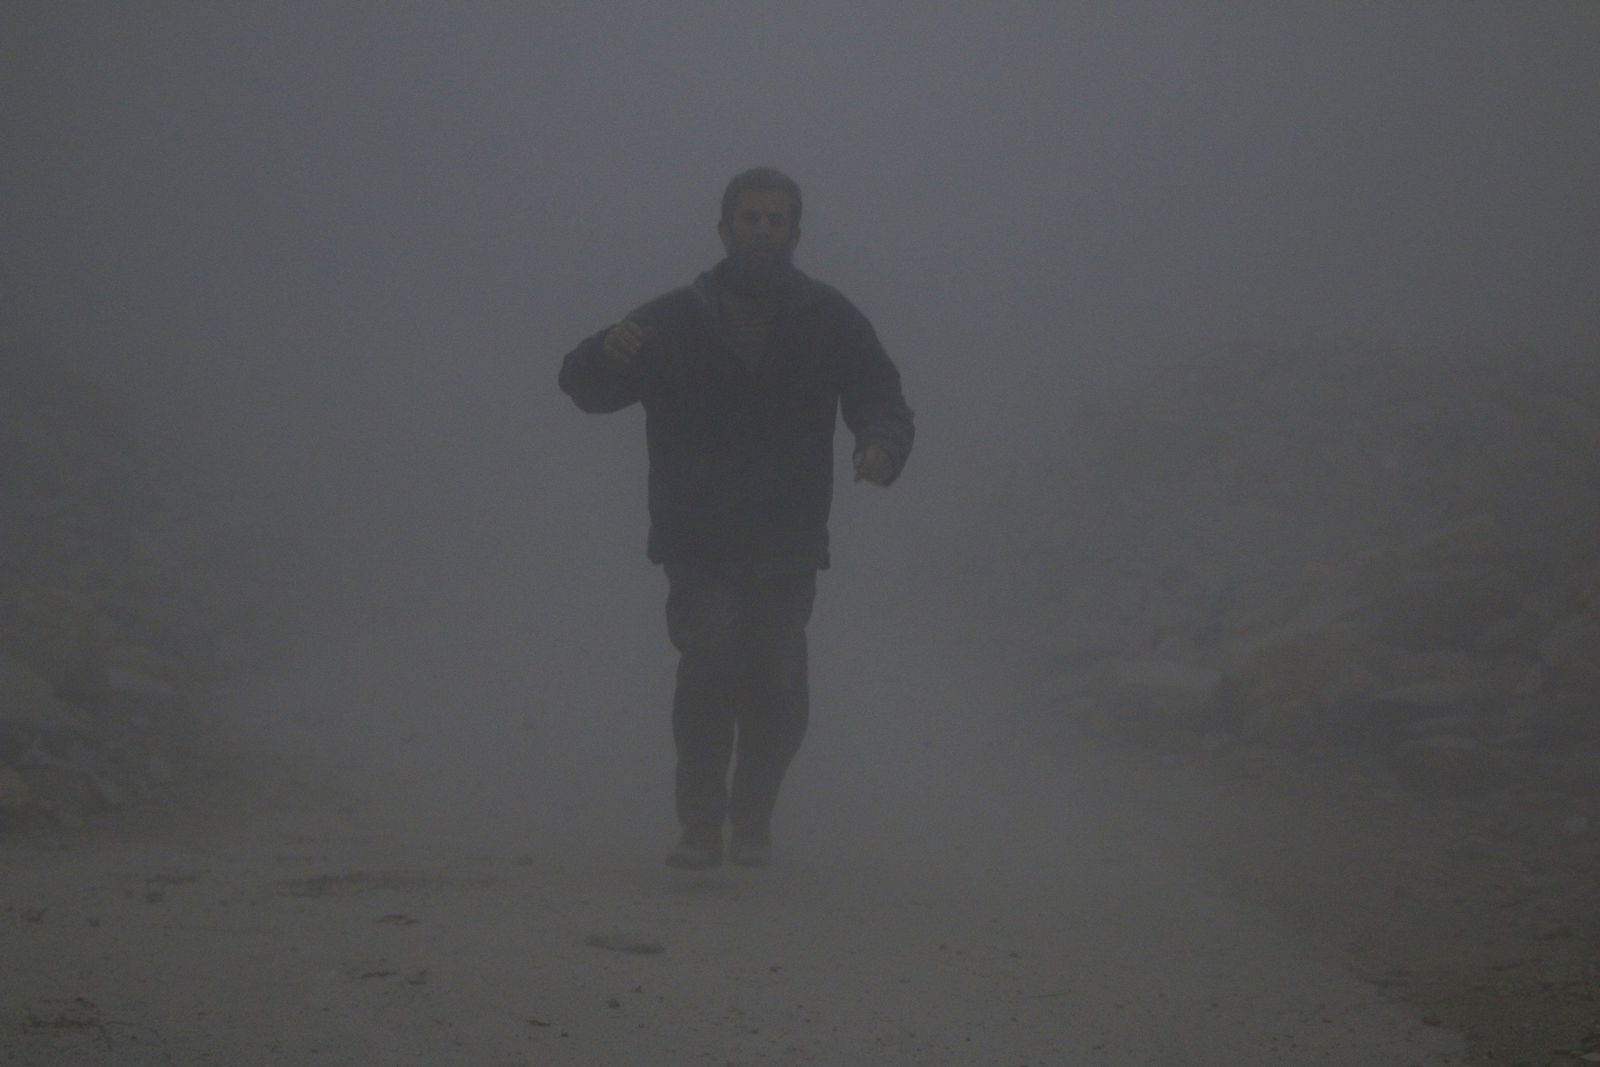 Syrien/ Aleppo / Luftangriffe / al-Ansari